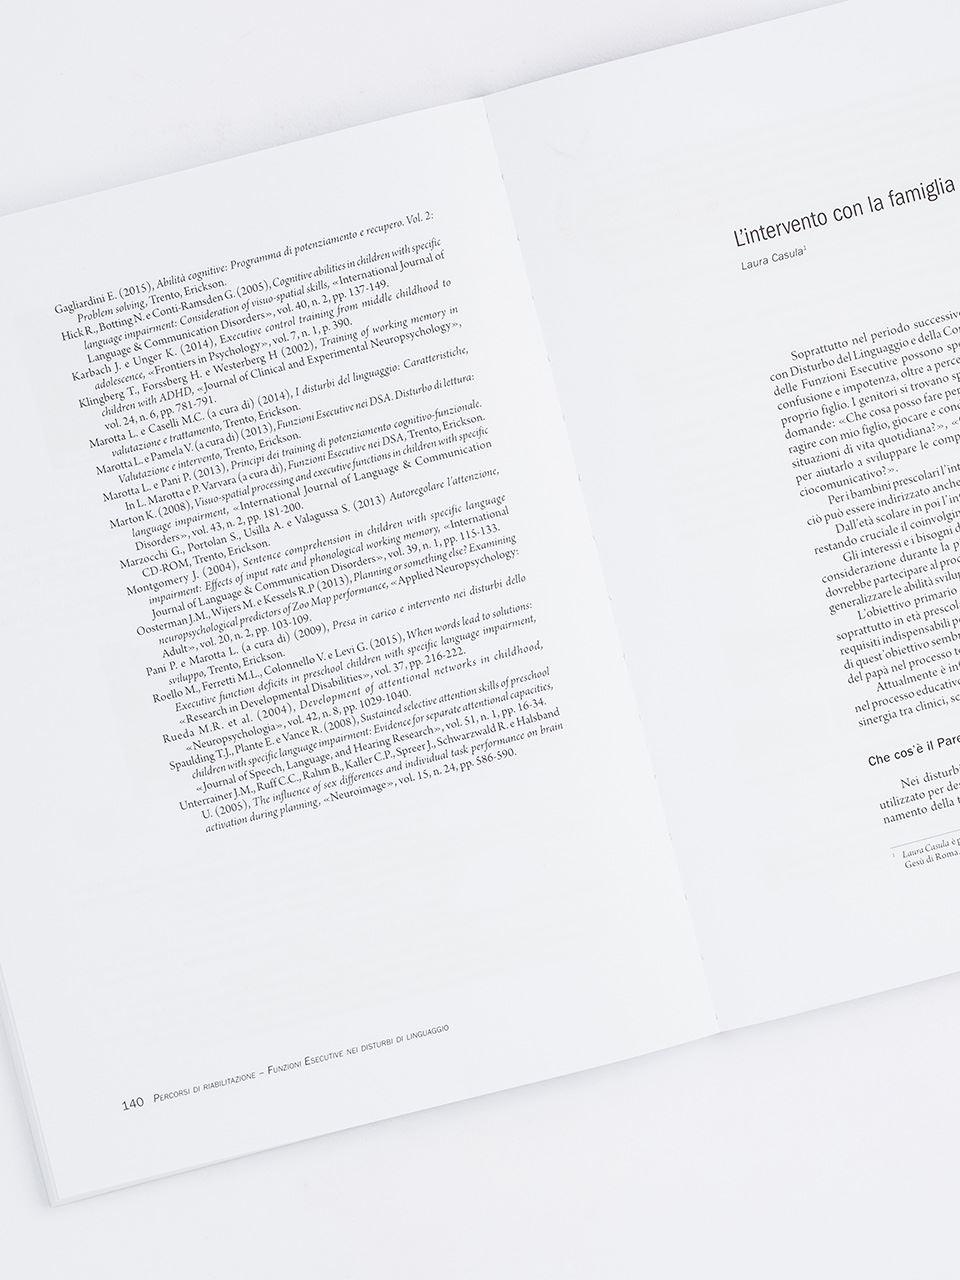 Percorsi di riabilitazione - Funzioni esecutive ne - Libri - Erickson 2